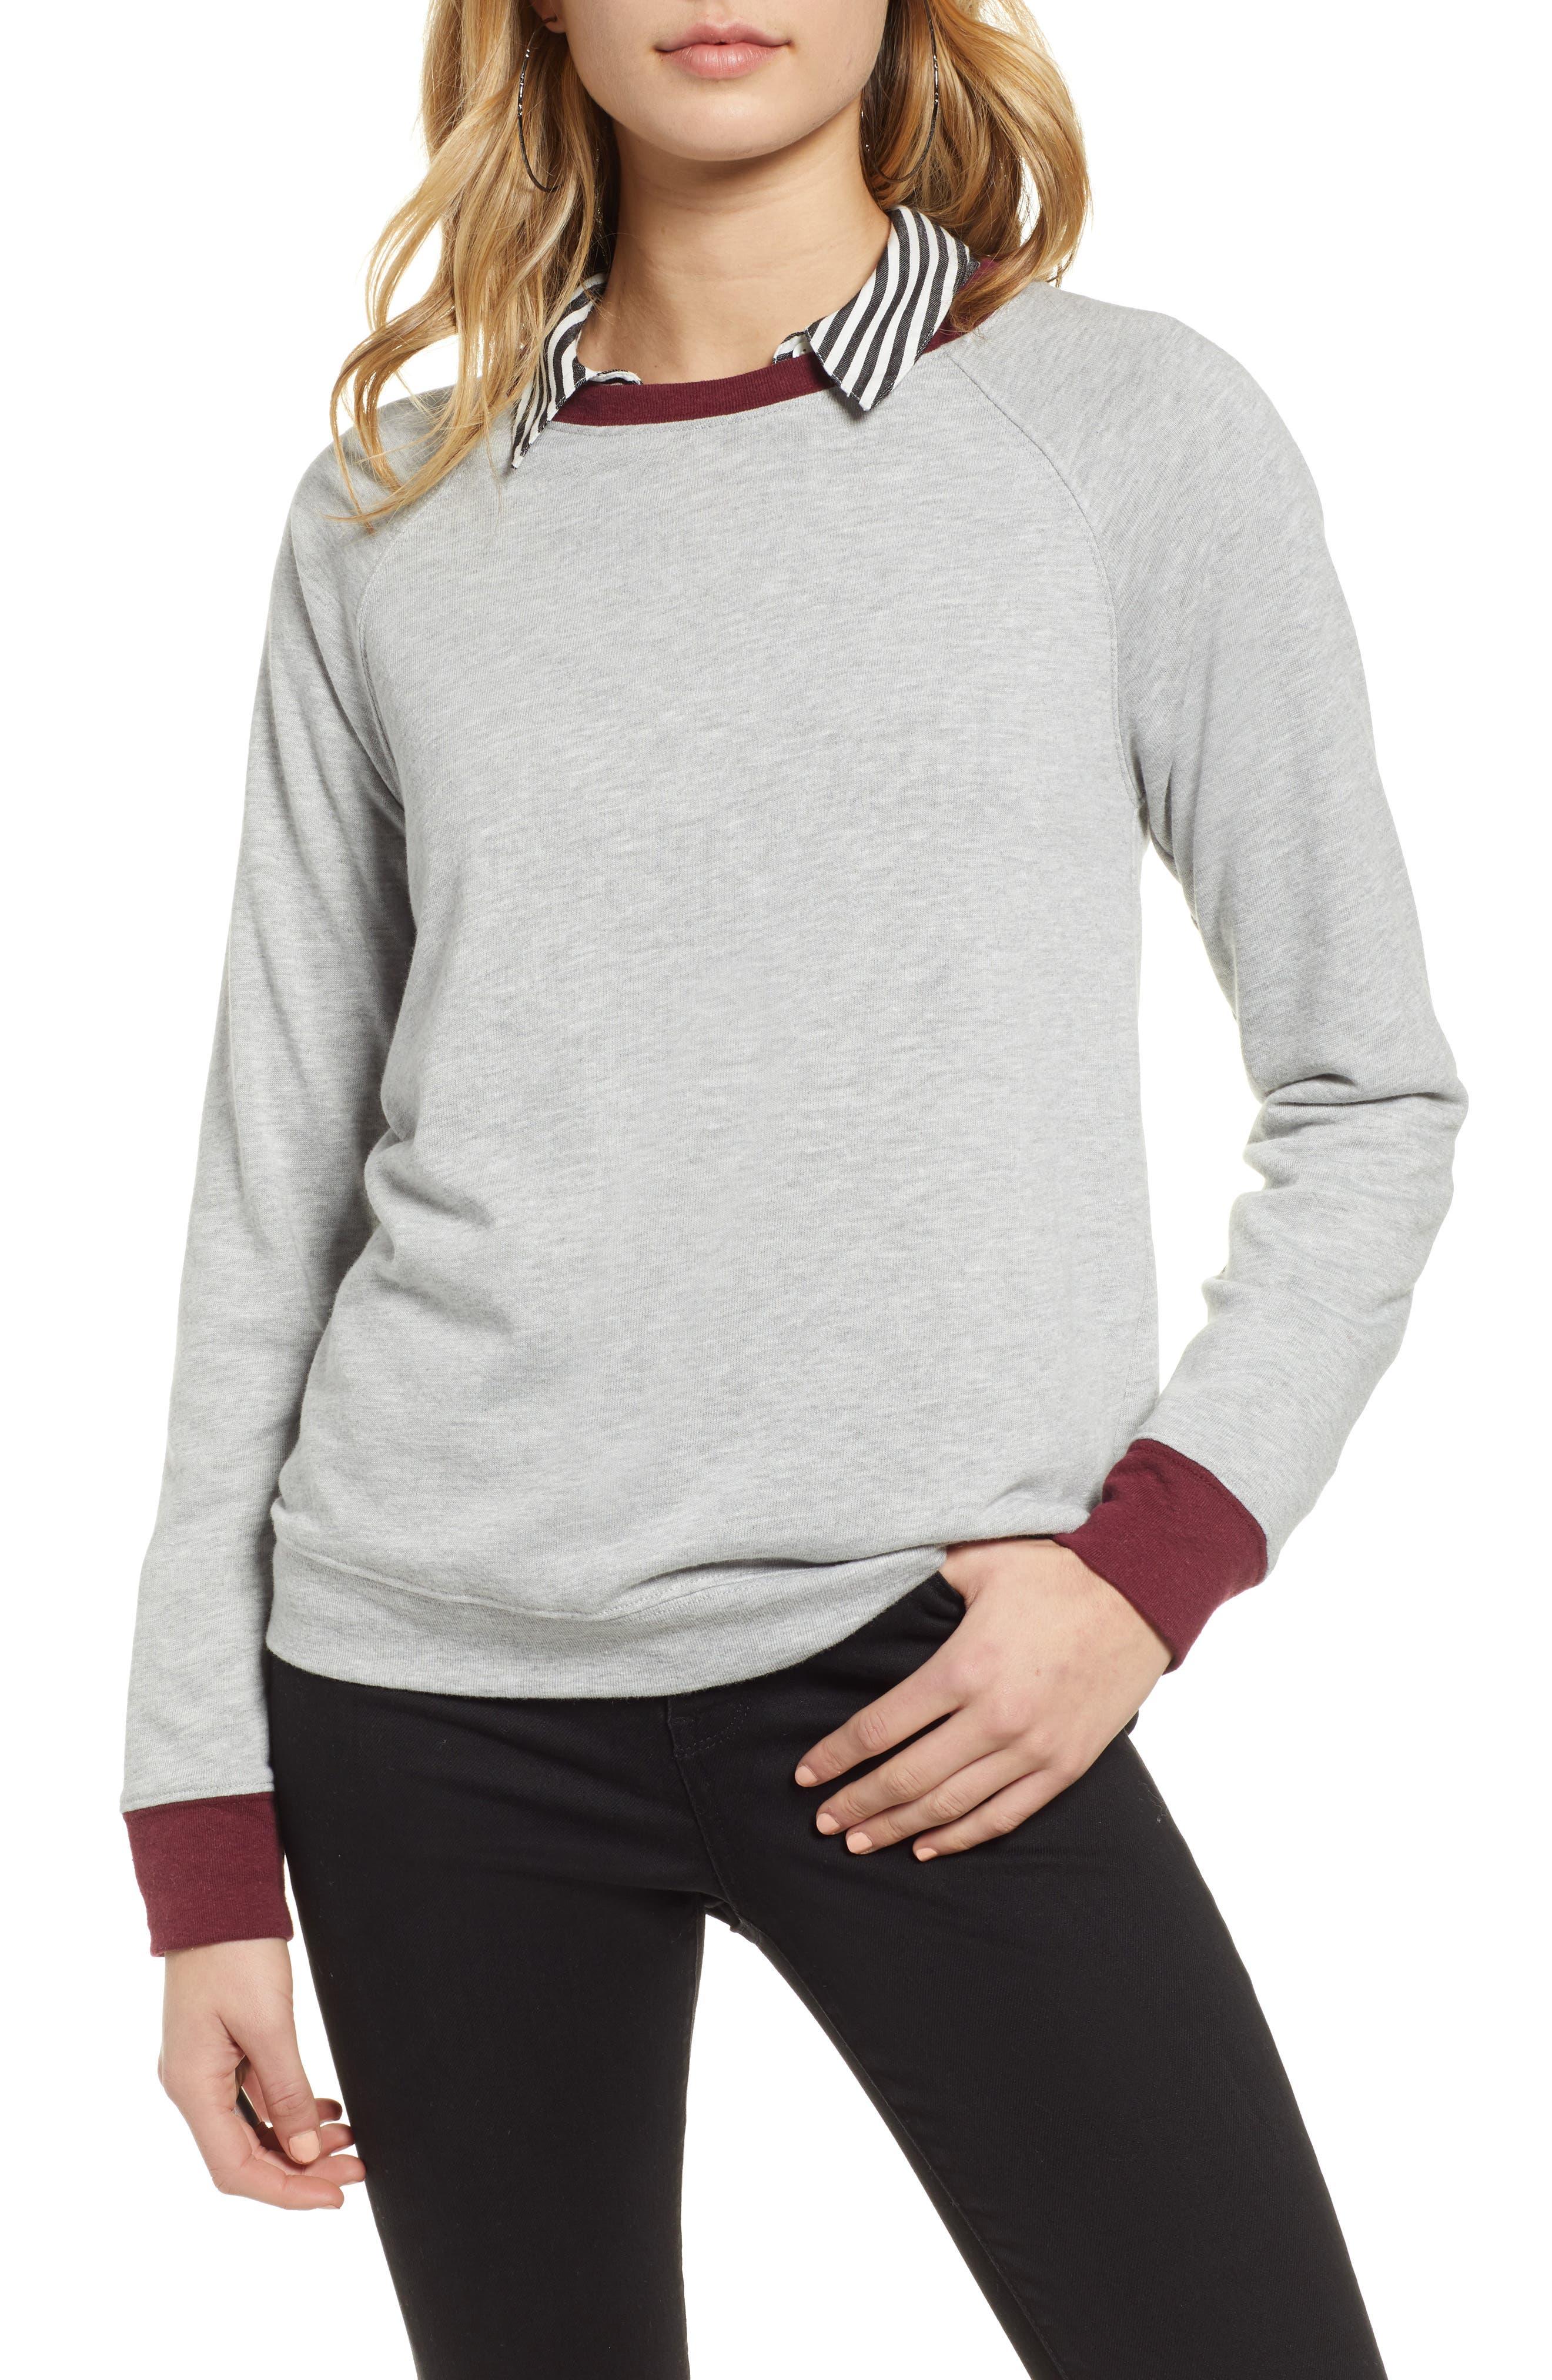 TREASURE & BOND, Crewneck Sweatshirt, Main thumbnail 1, color, GREY HEATHER- RED TANNIN COMBO